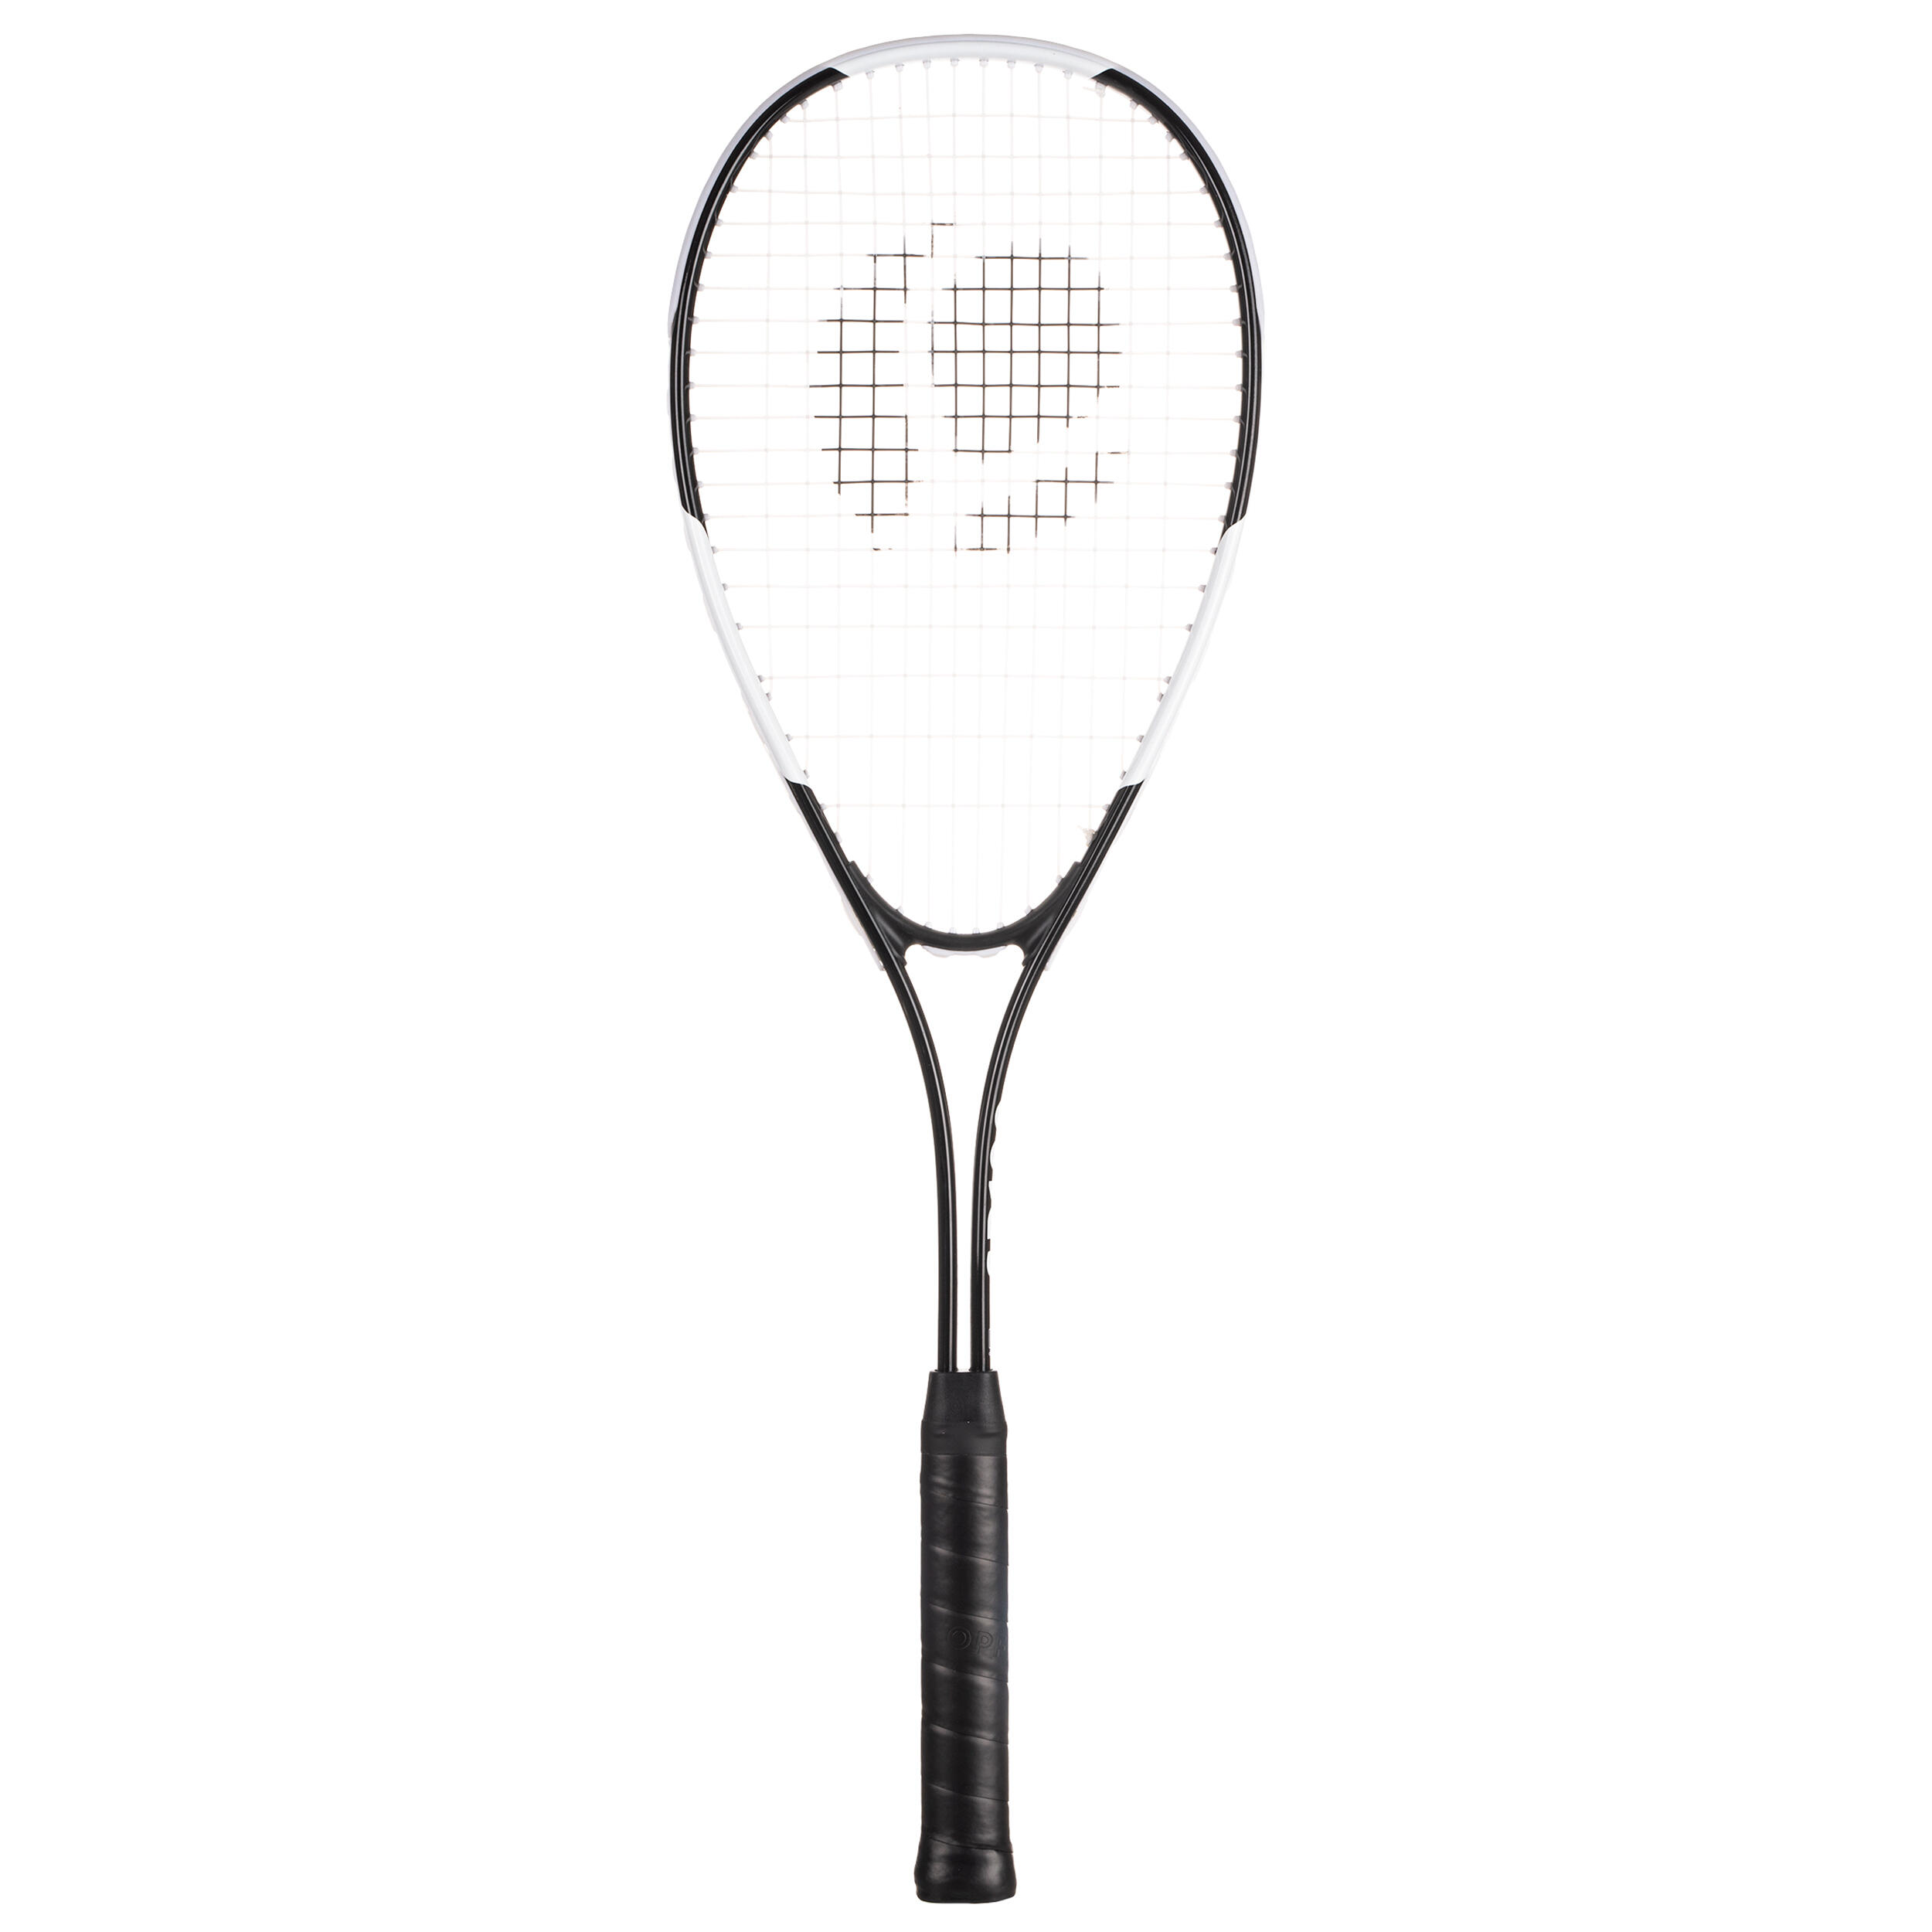 Rachetă Squash 100 imagine